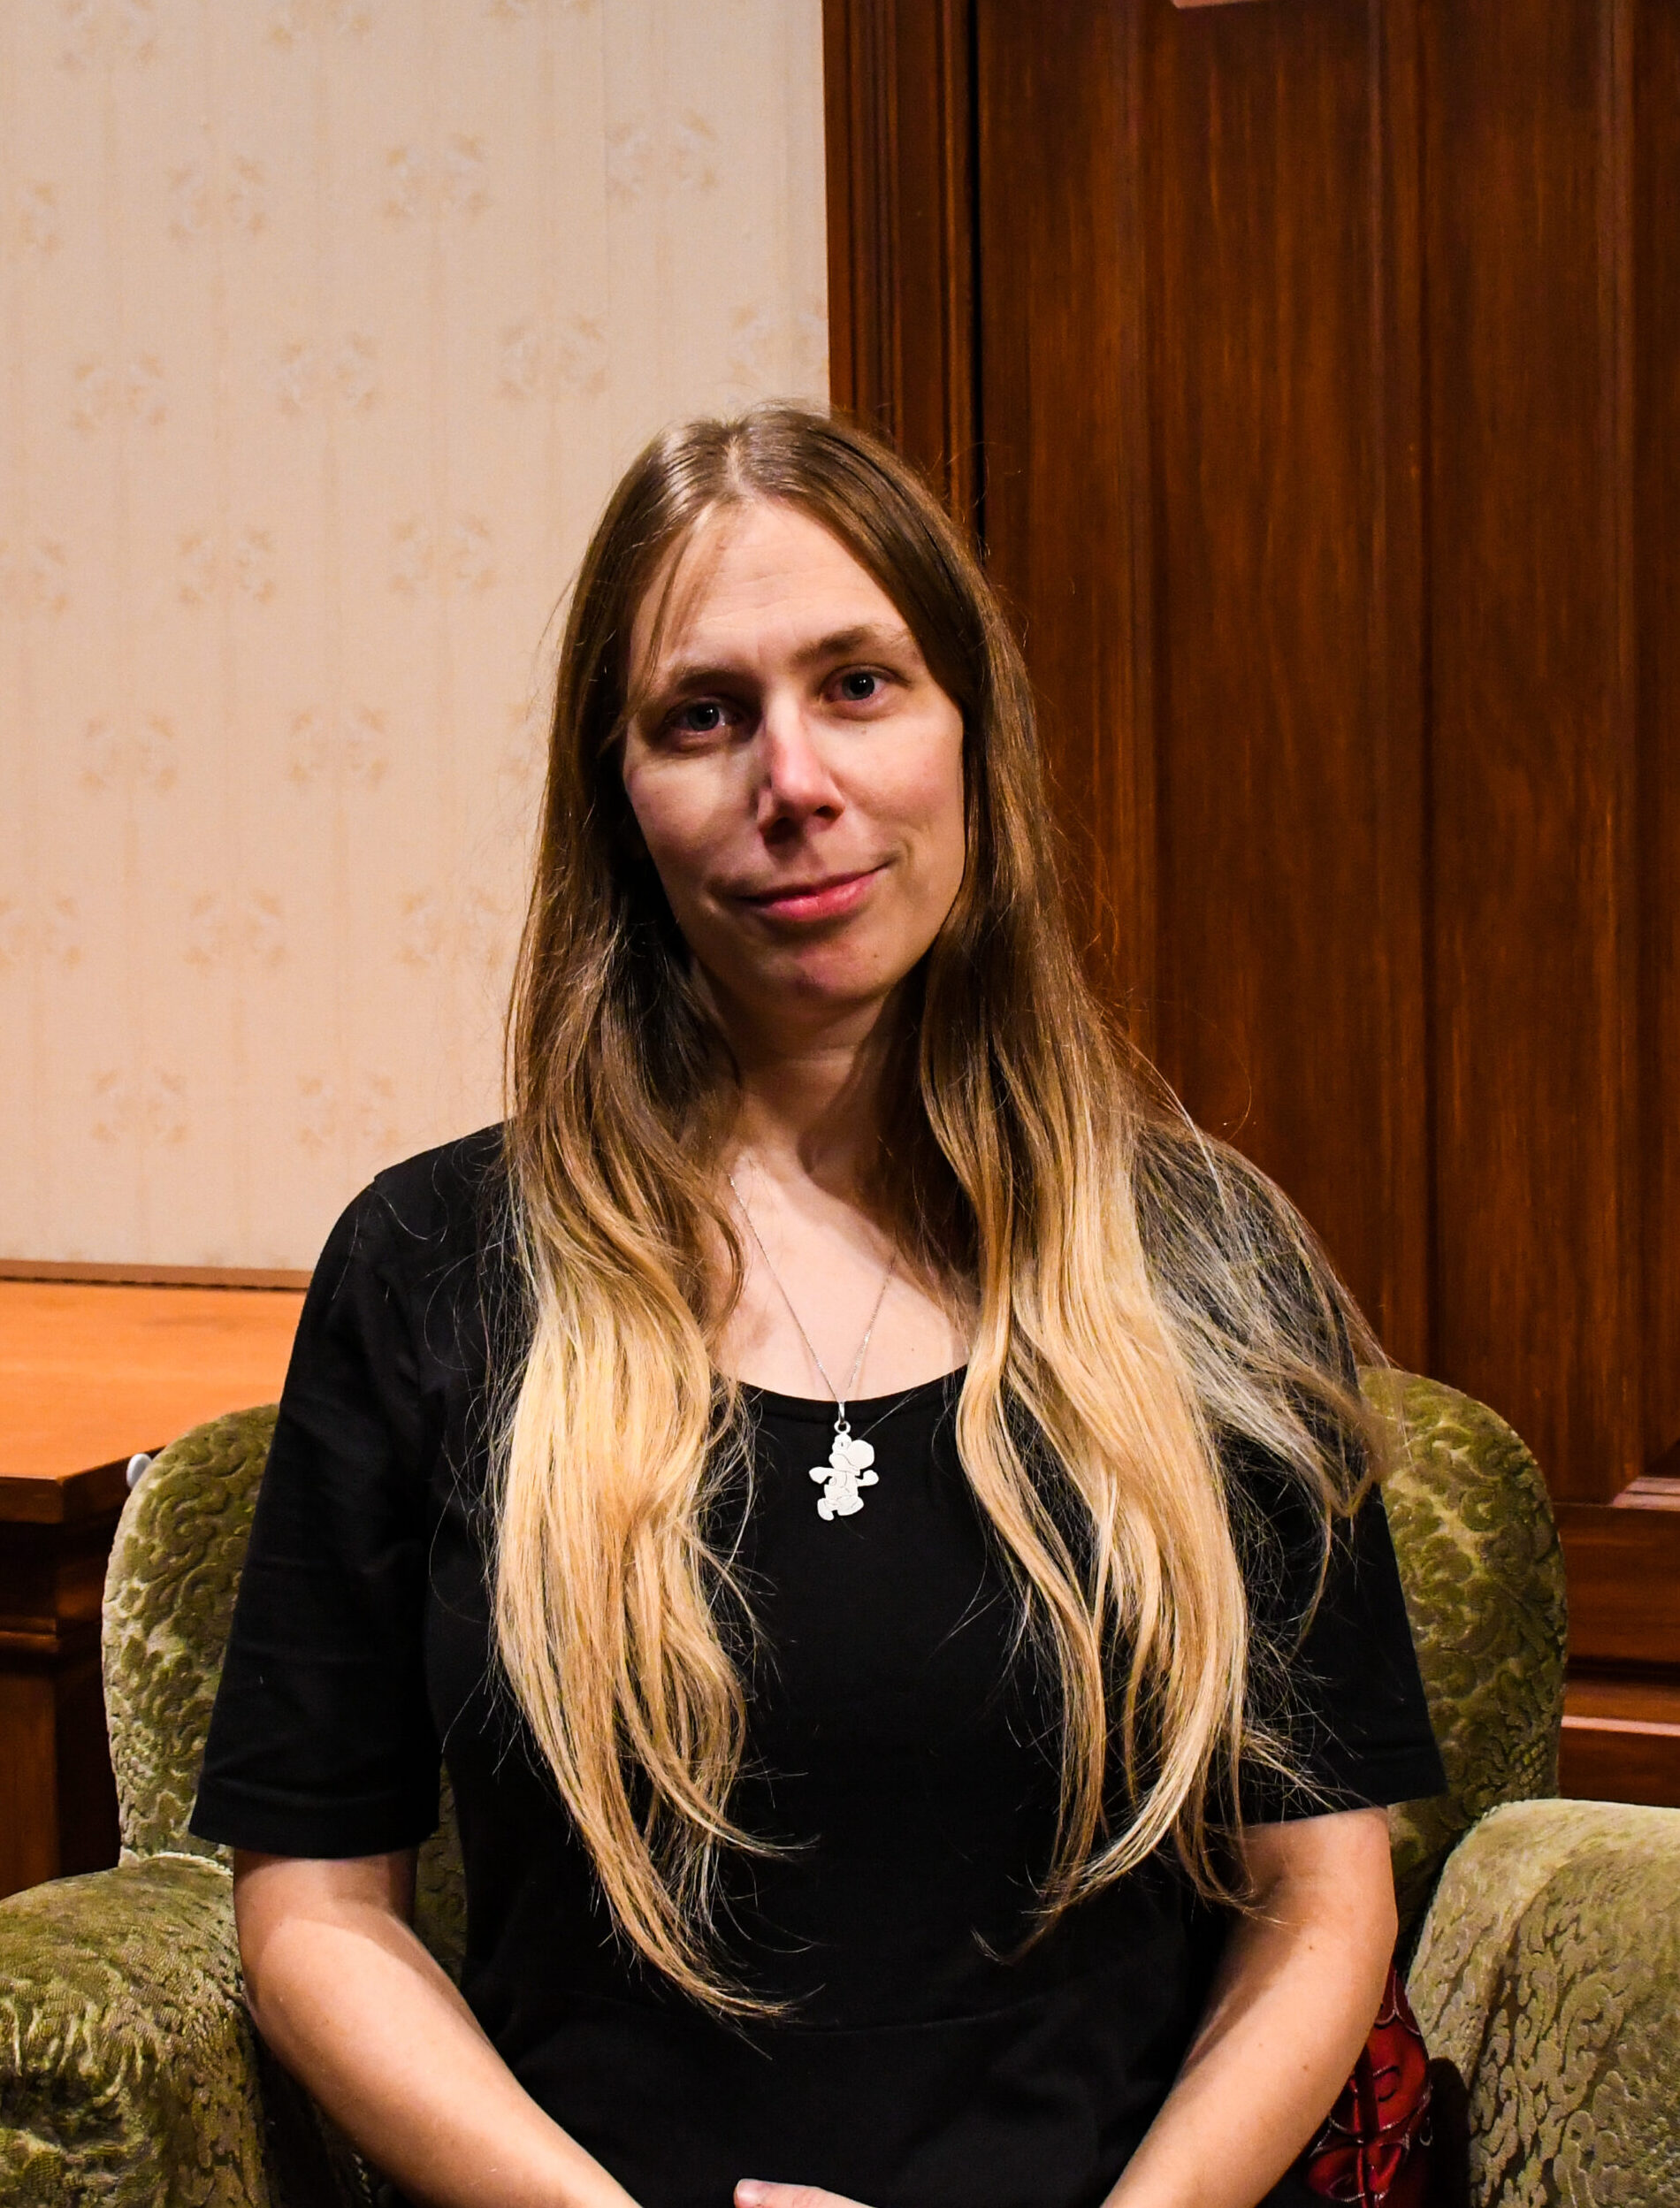 Veronica Hjalmarsson